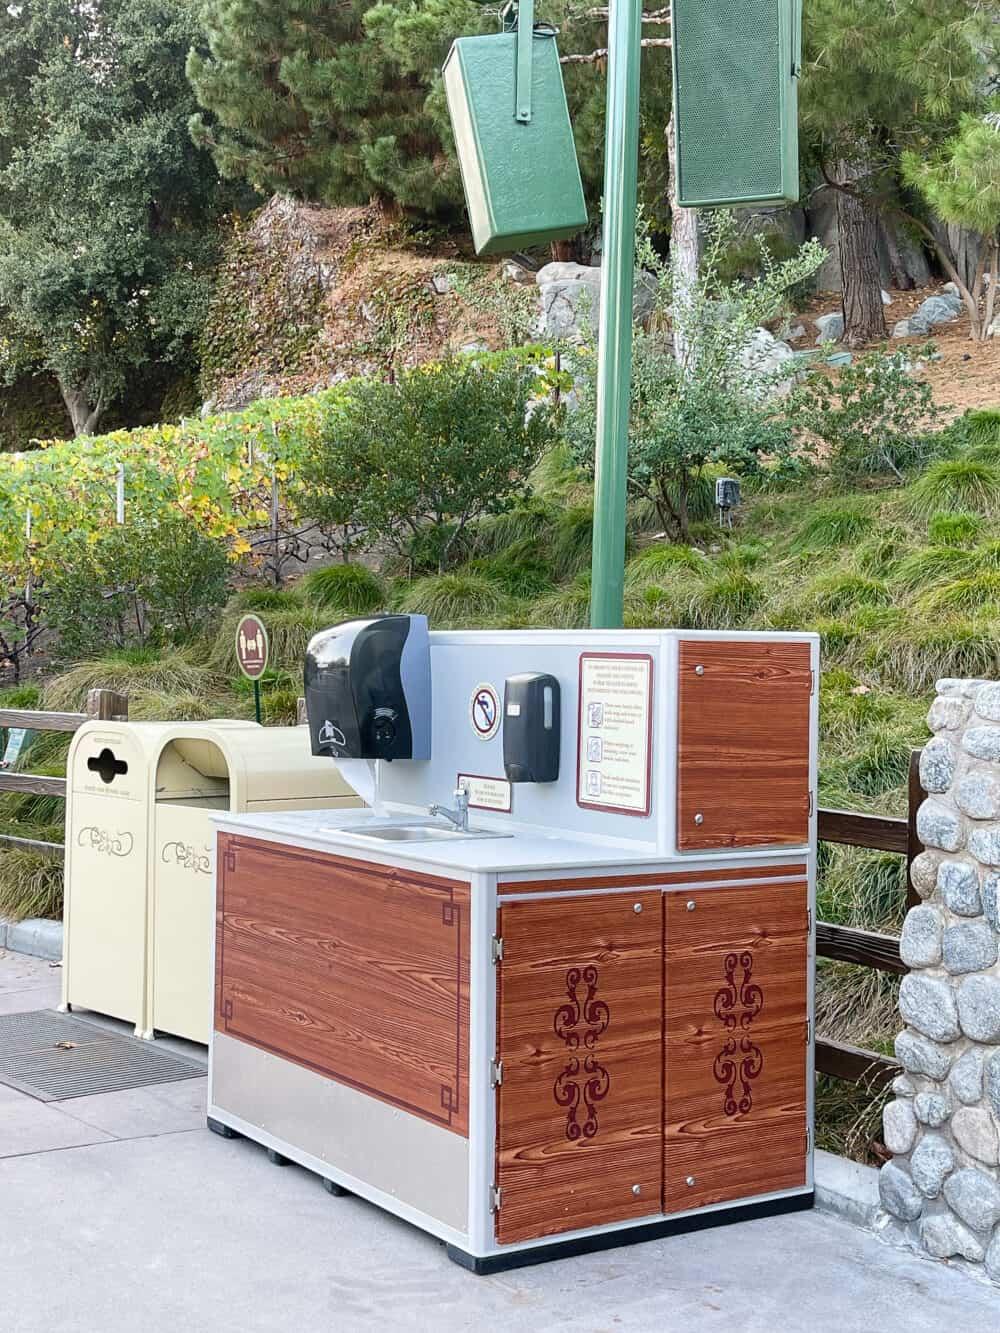 hand washing station buena vista street